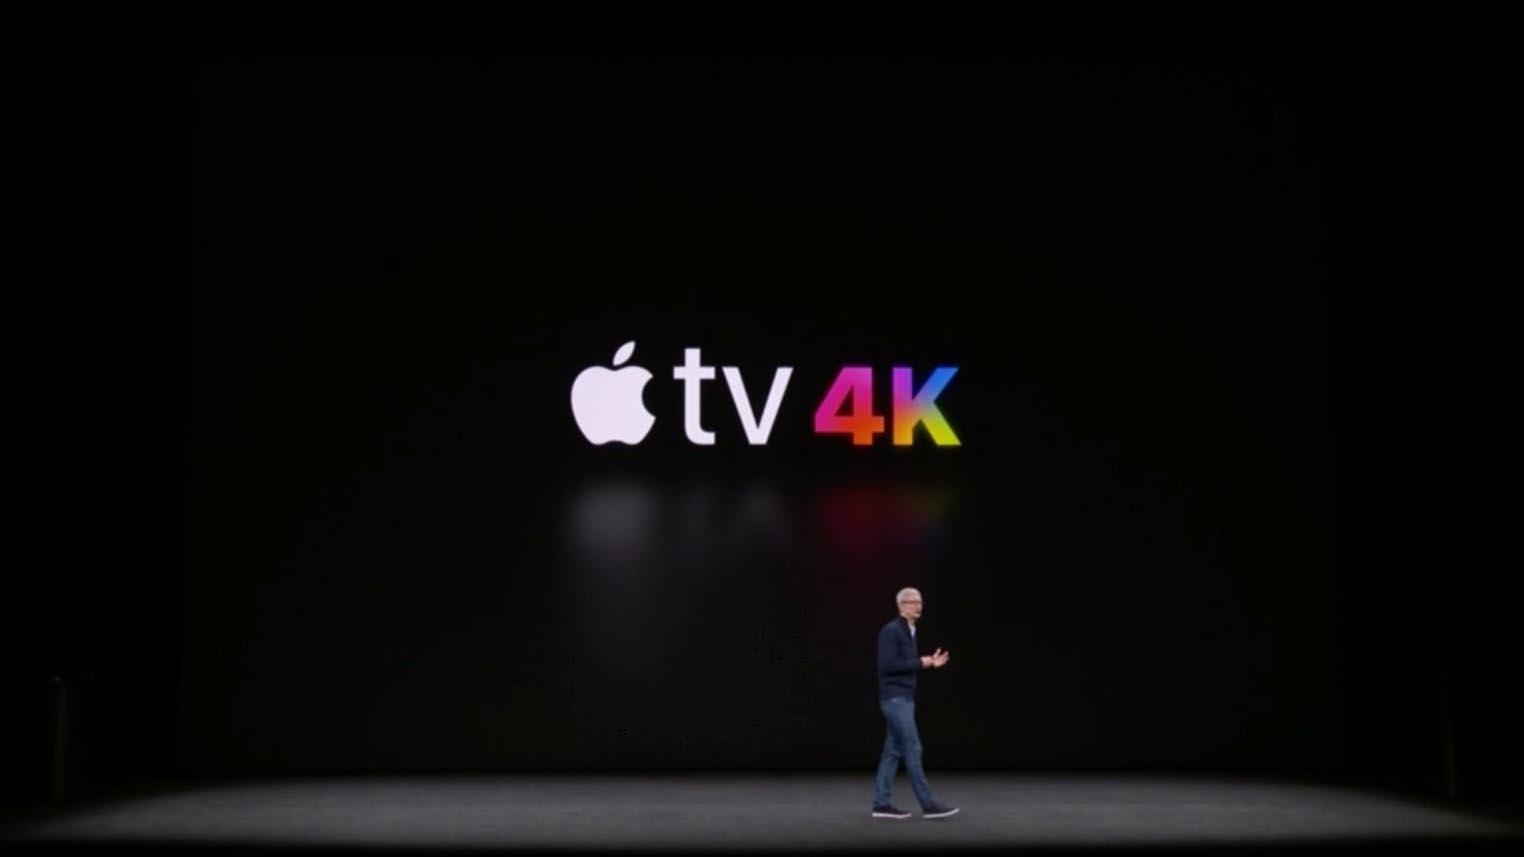 Apple TV 4K keynote